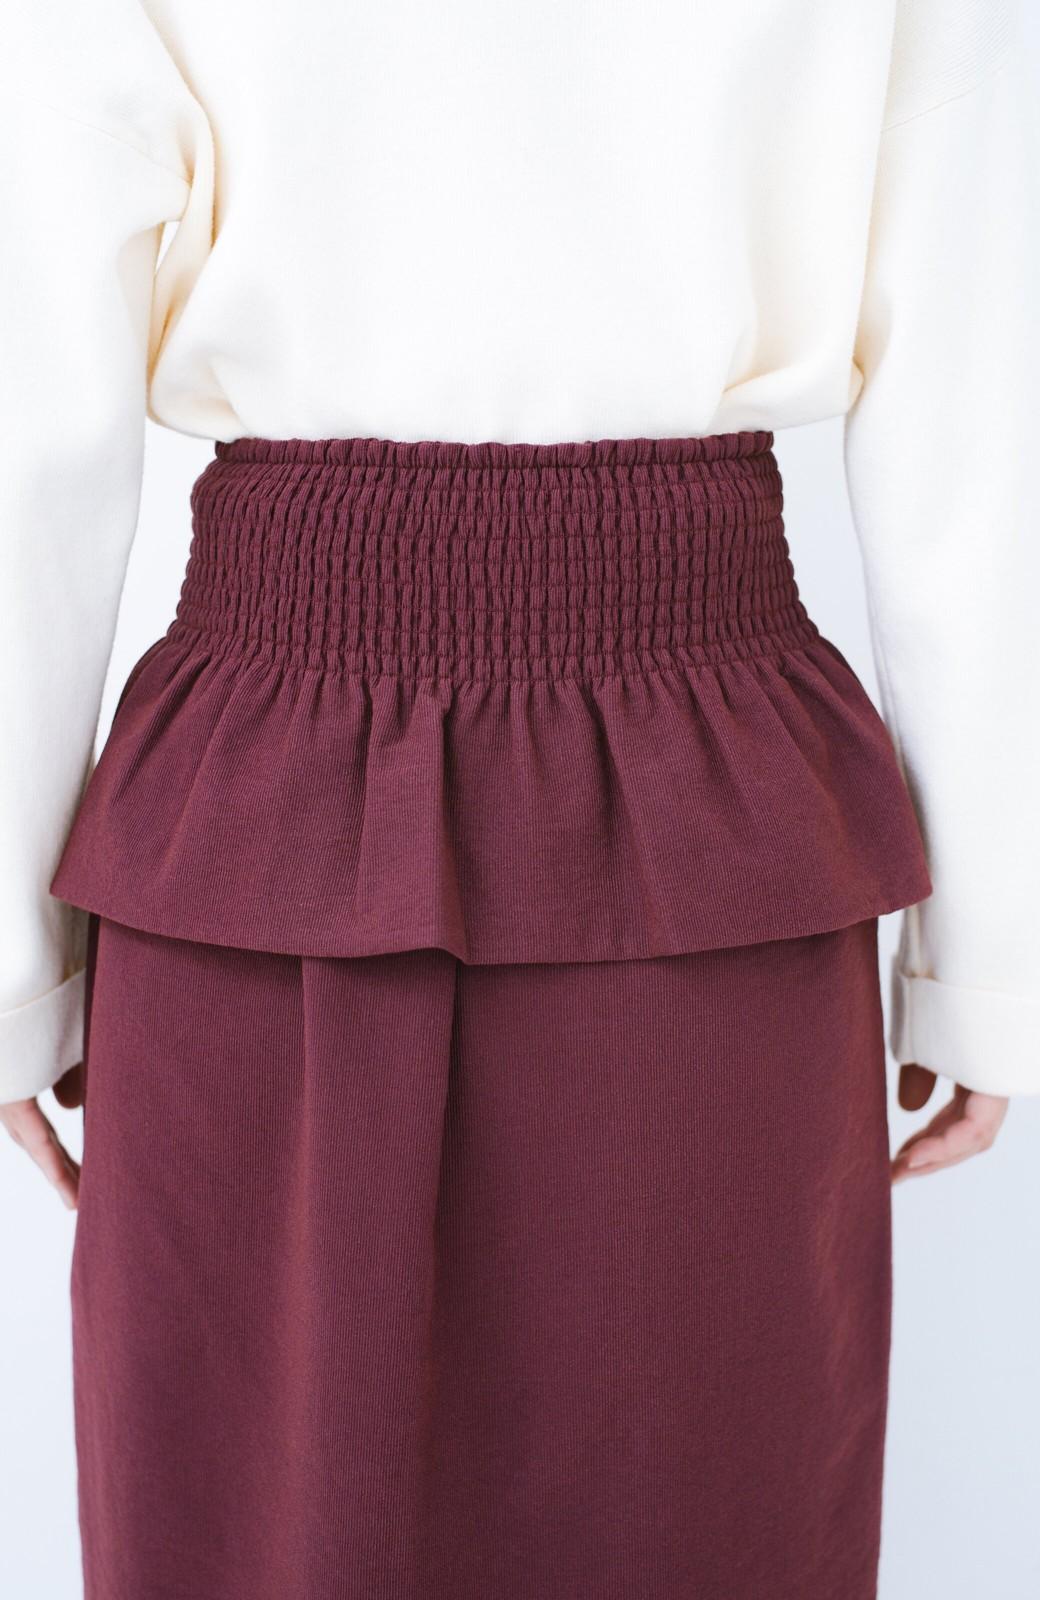 haco!  腹巻きとは呼ばせない ブルー期も華やかに過ごせる消臭加工裏地付きフリルデザインスカートセット【ブルー期】女の子バンザイ!プロジェクト <ボルドー>の商品写真11